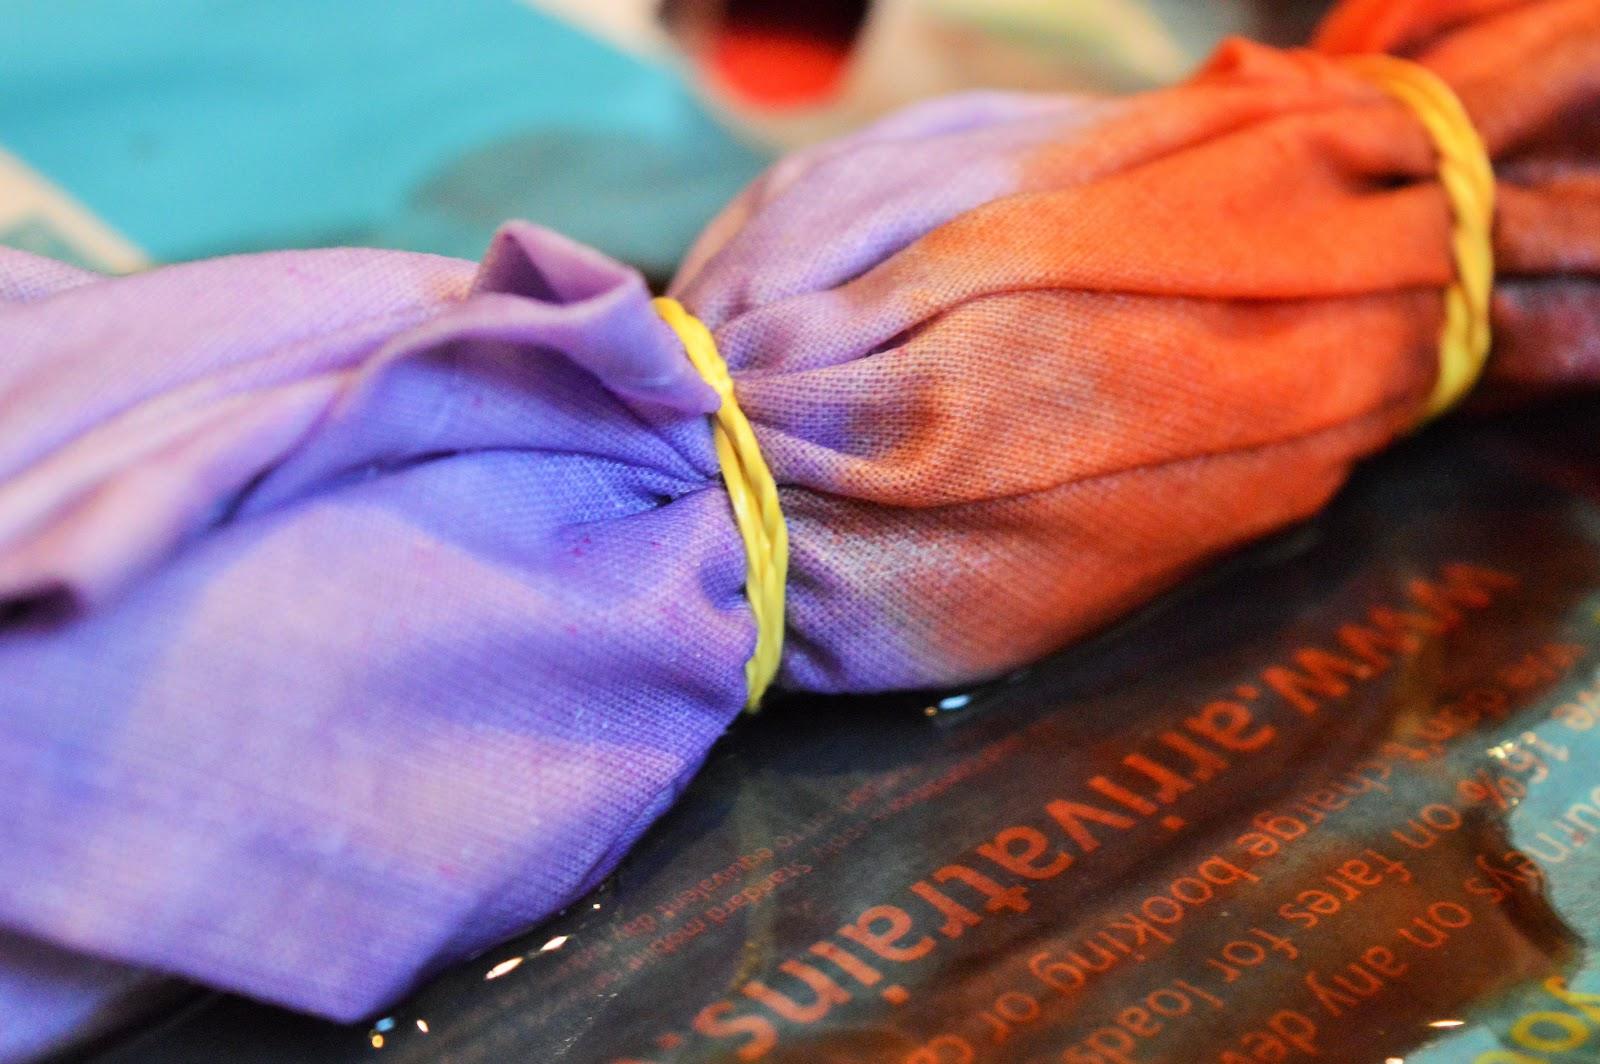 Tie-dye tea towels with Dylon!